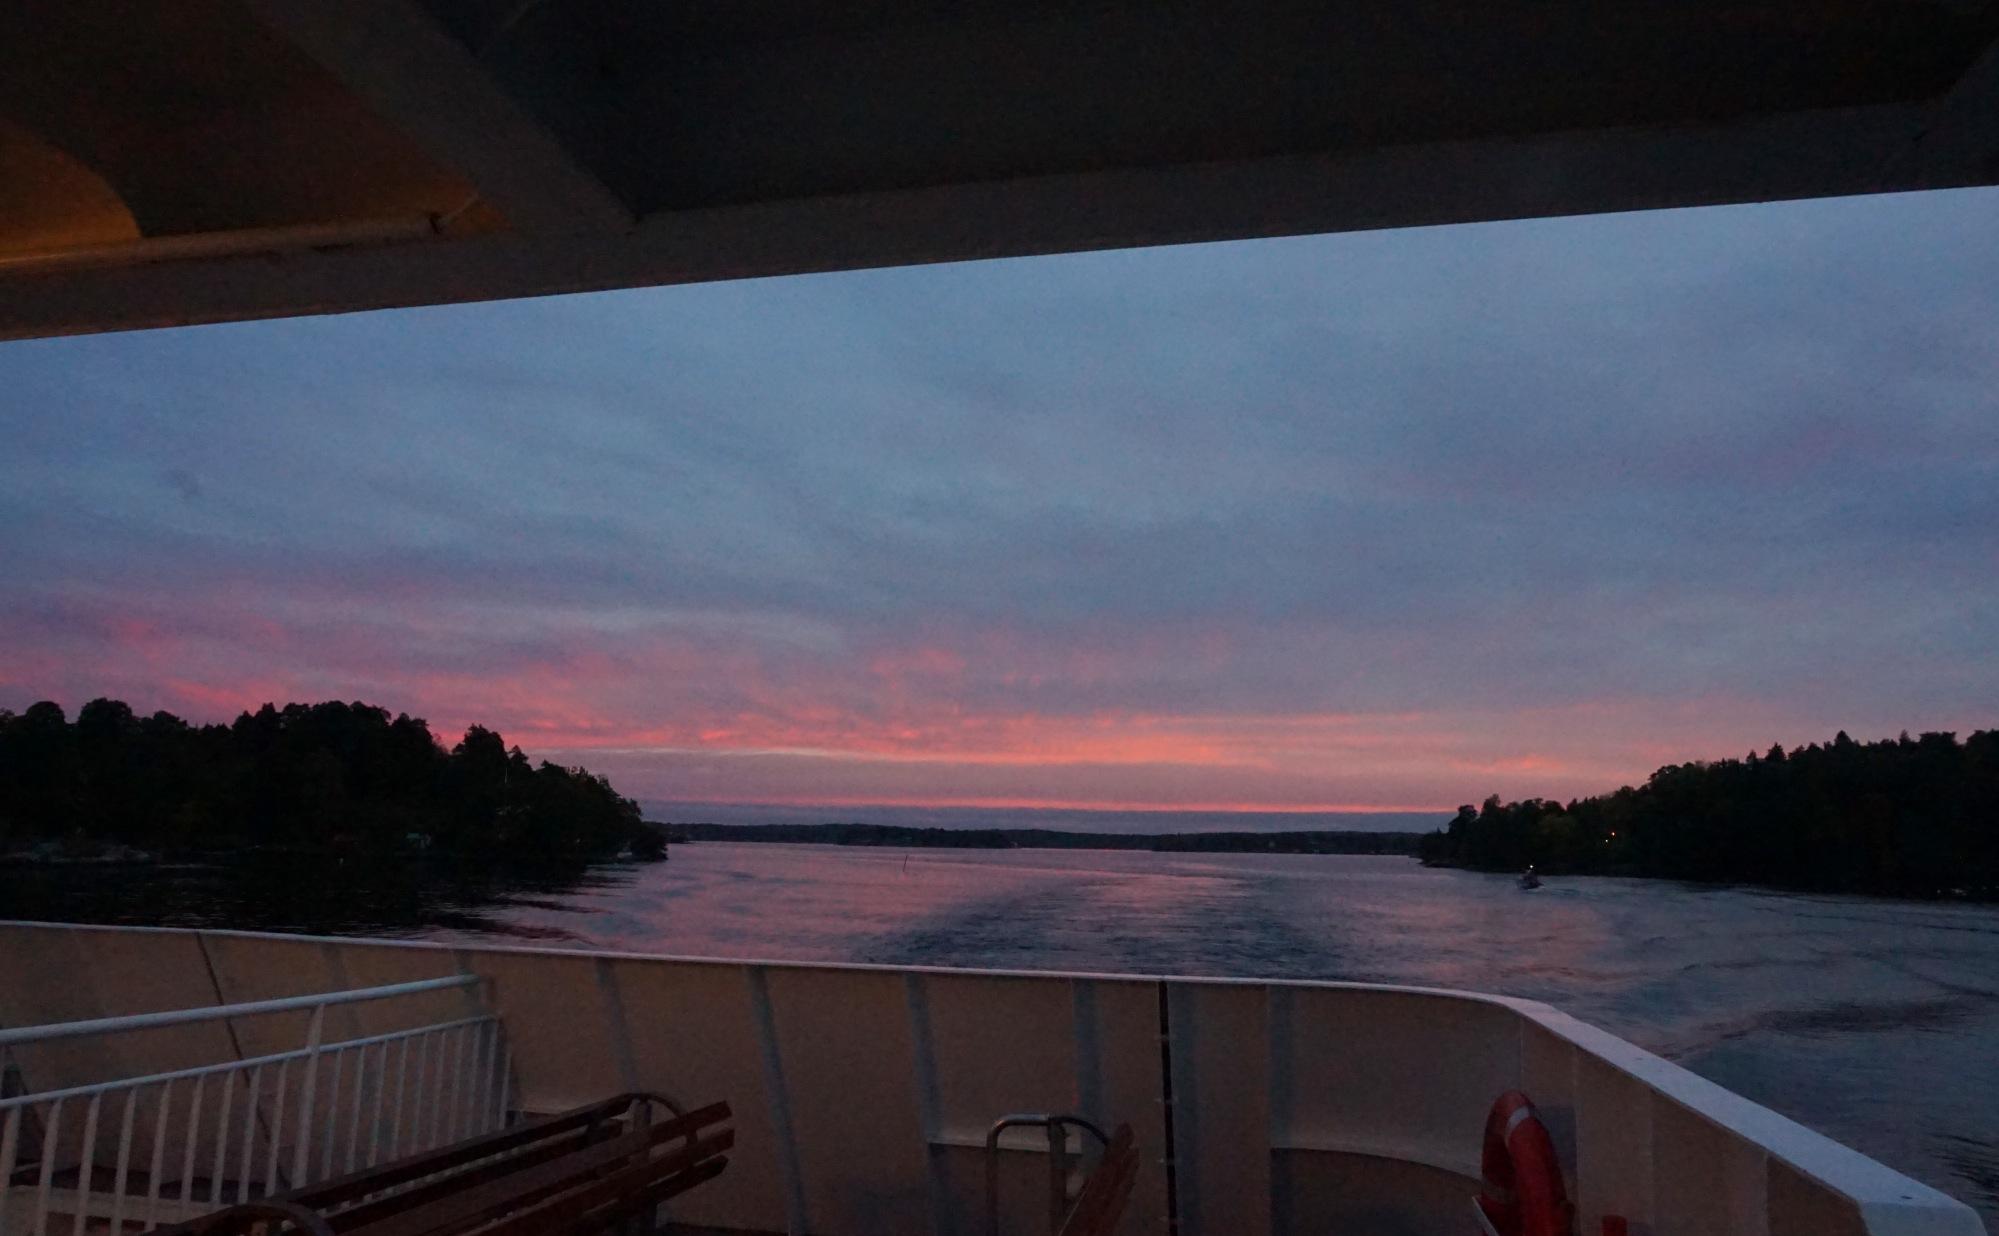 3-jours-a-stockholm-76